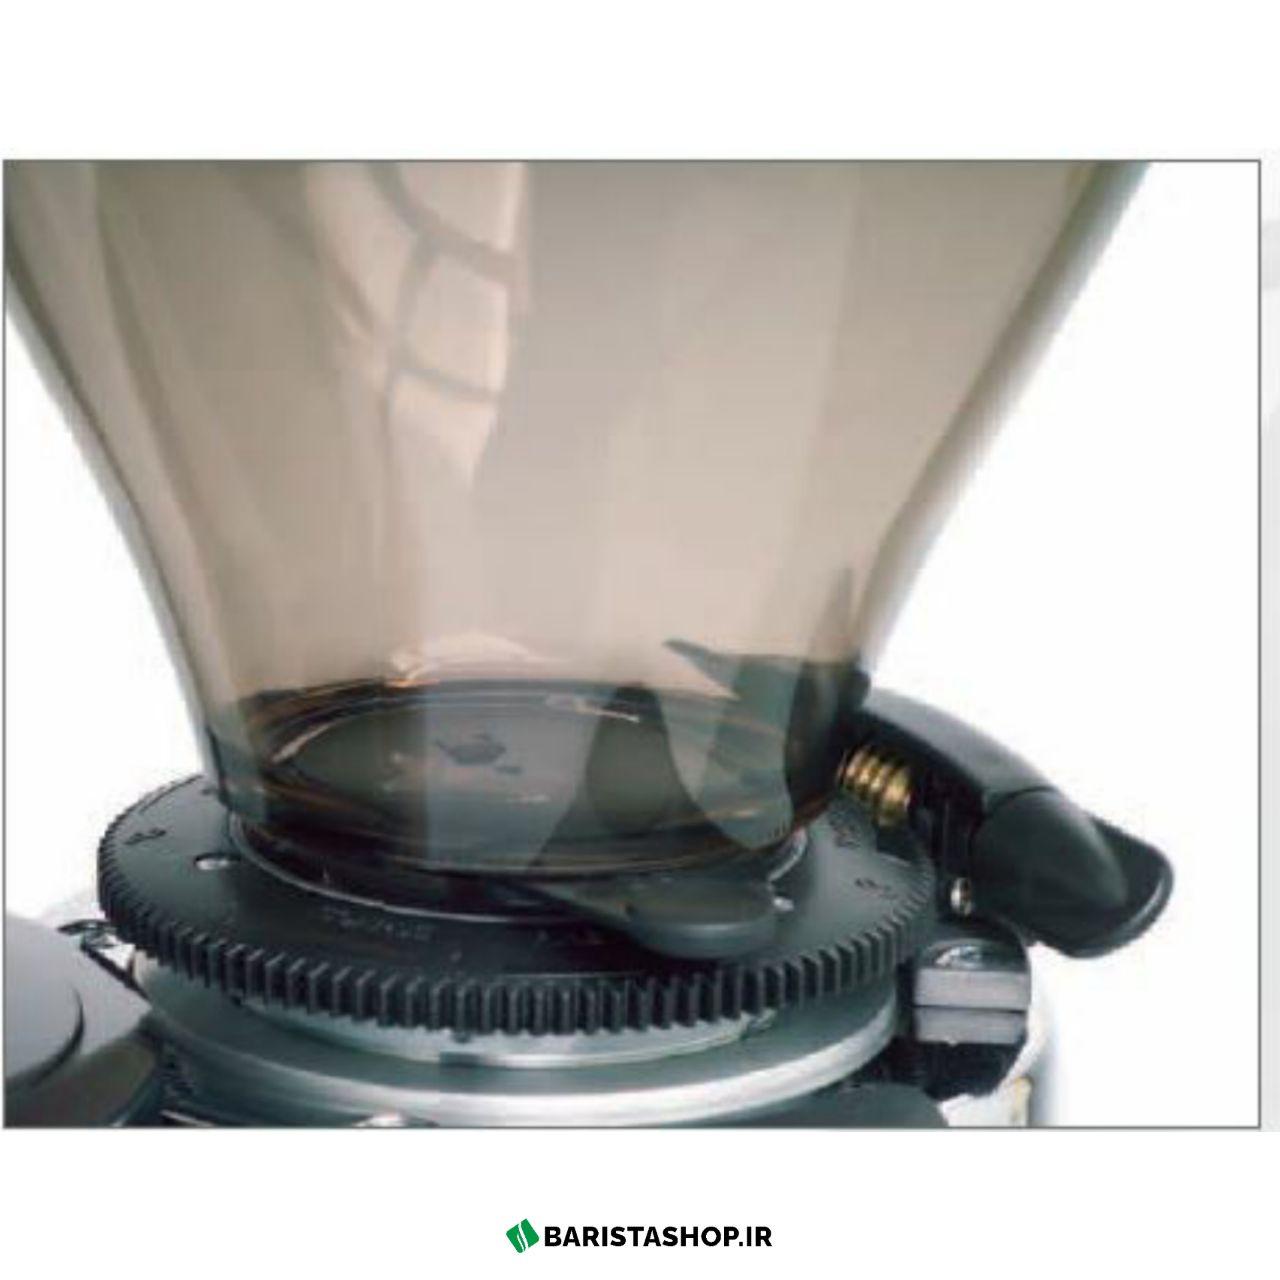 آسیاب لاسپازیاله آسترو 12D (3)